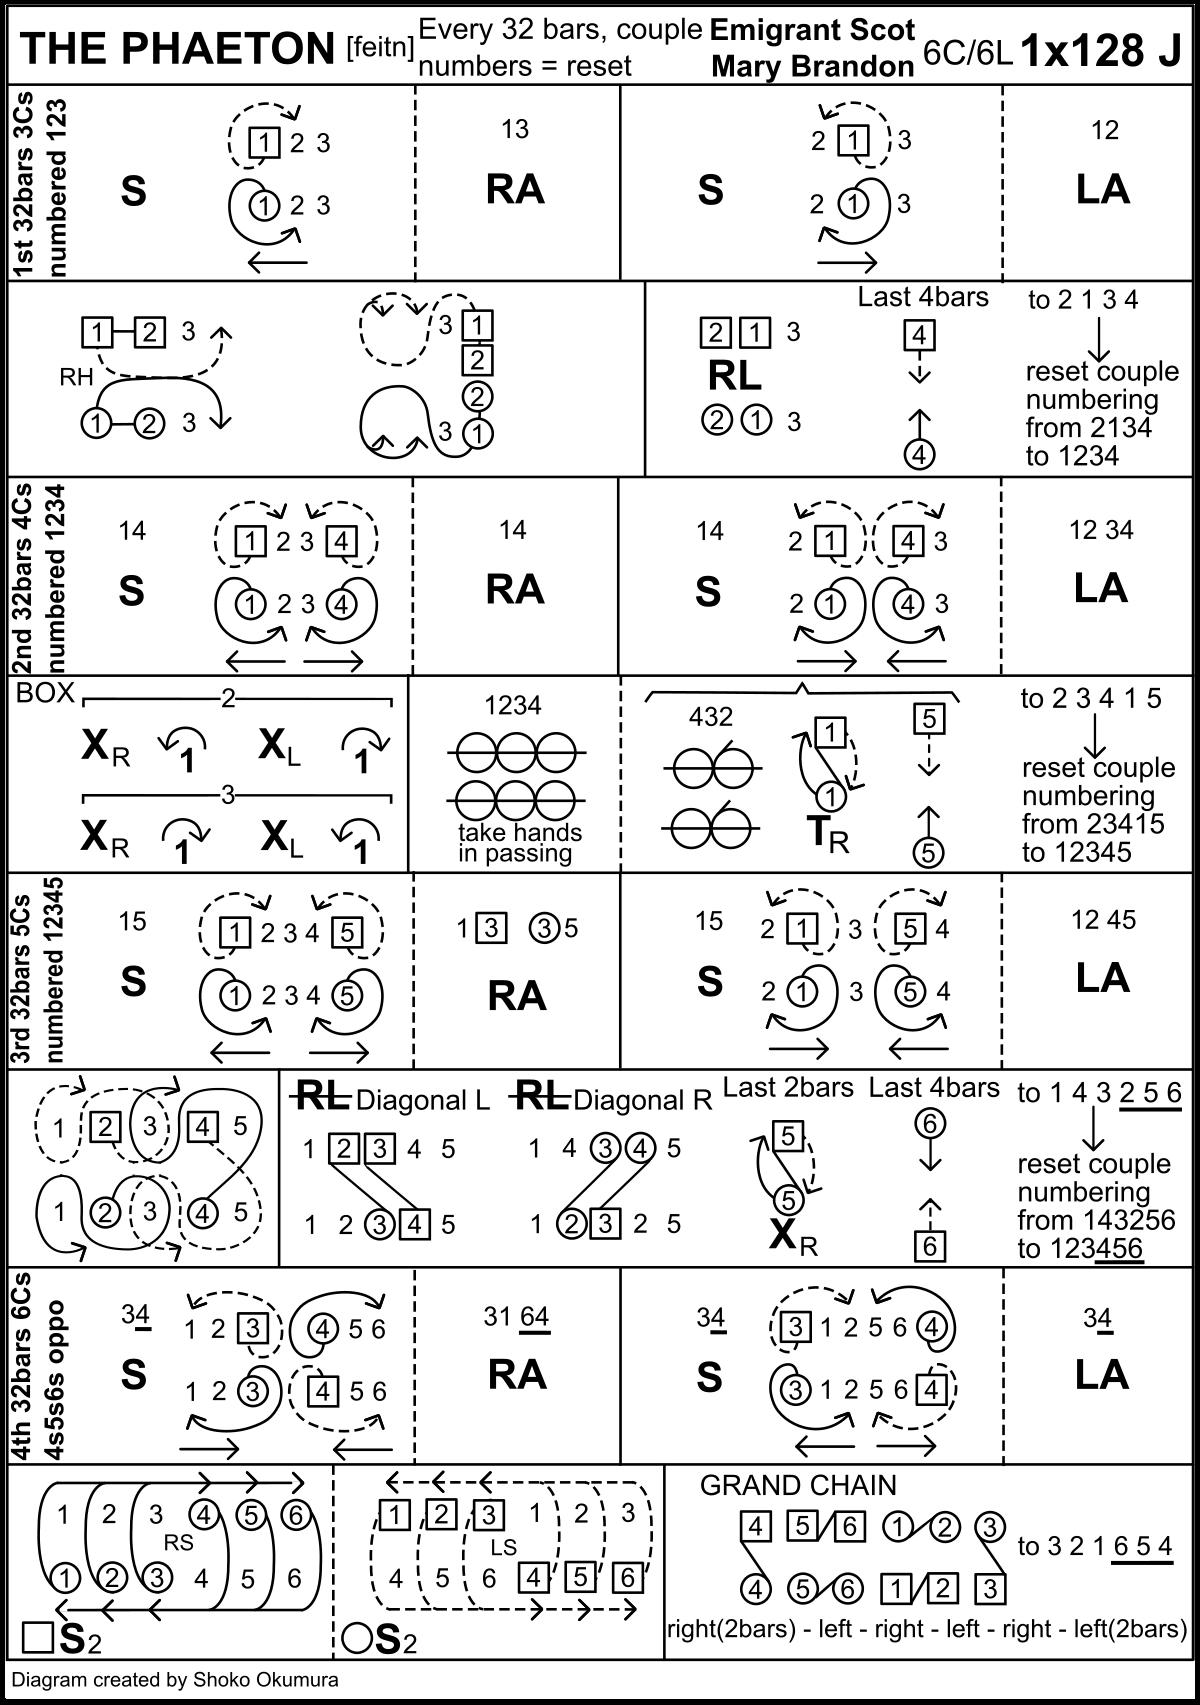 The Phaeton Keith Rose's Diagram